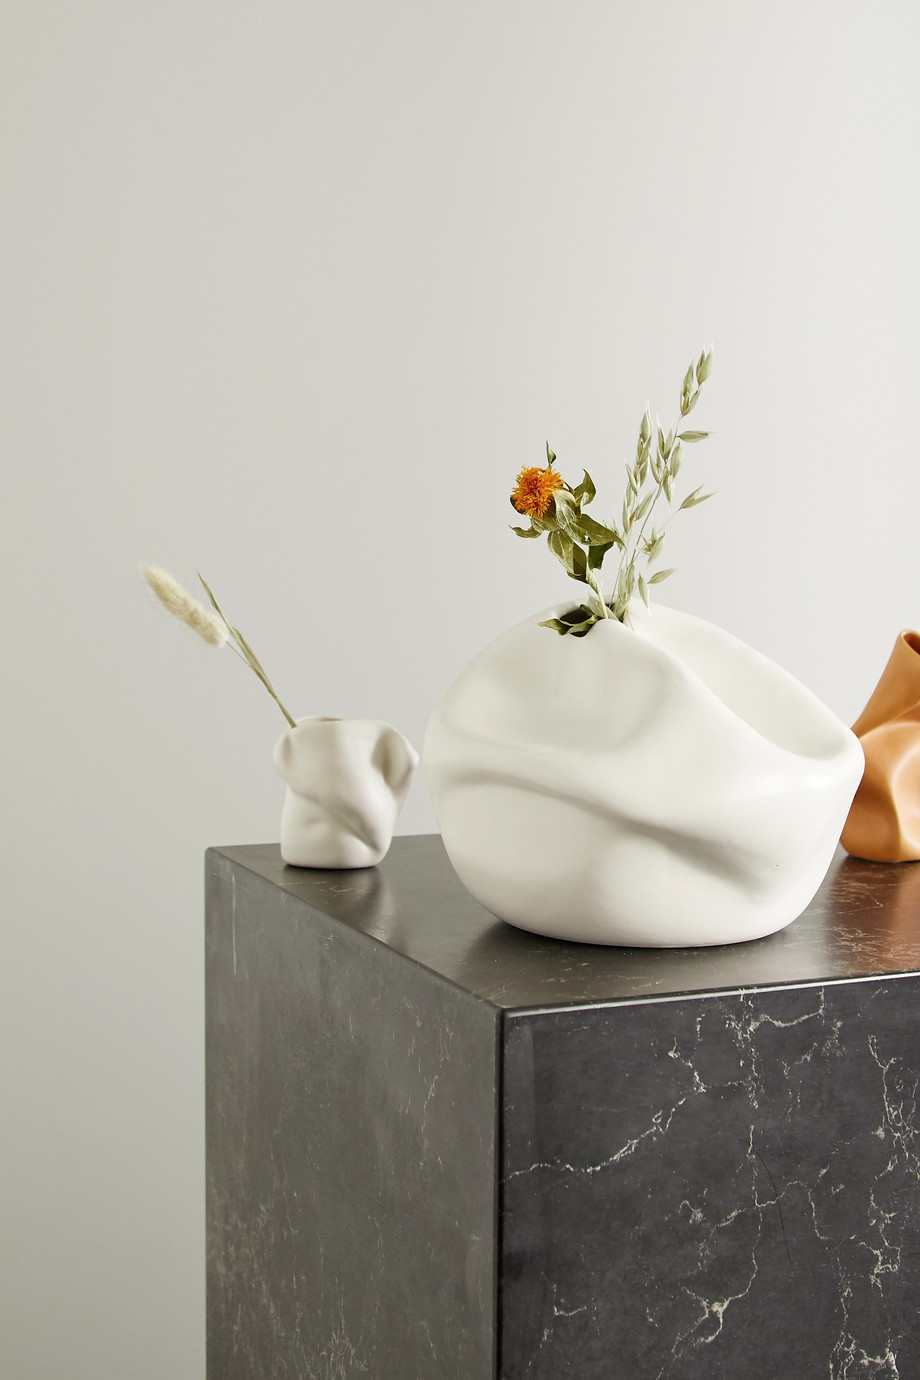 Completedworks + Ekaterina Bazhenova Yamasaki Compound ceramic vase